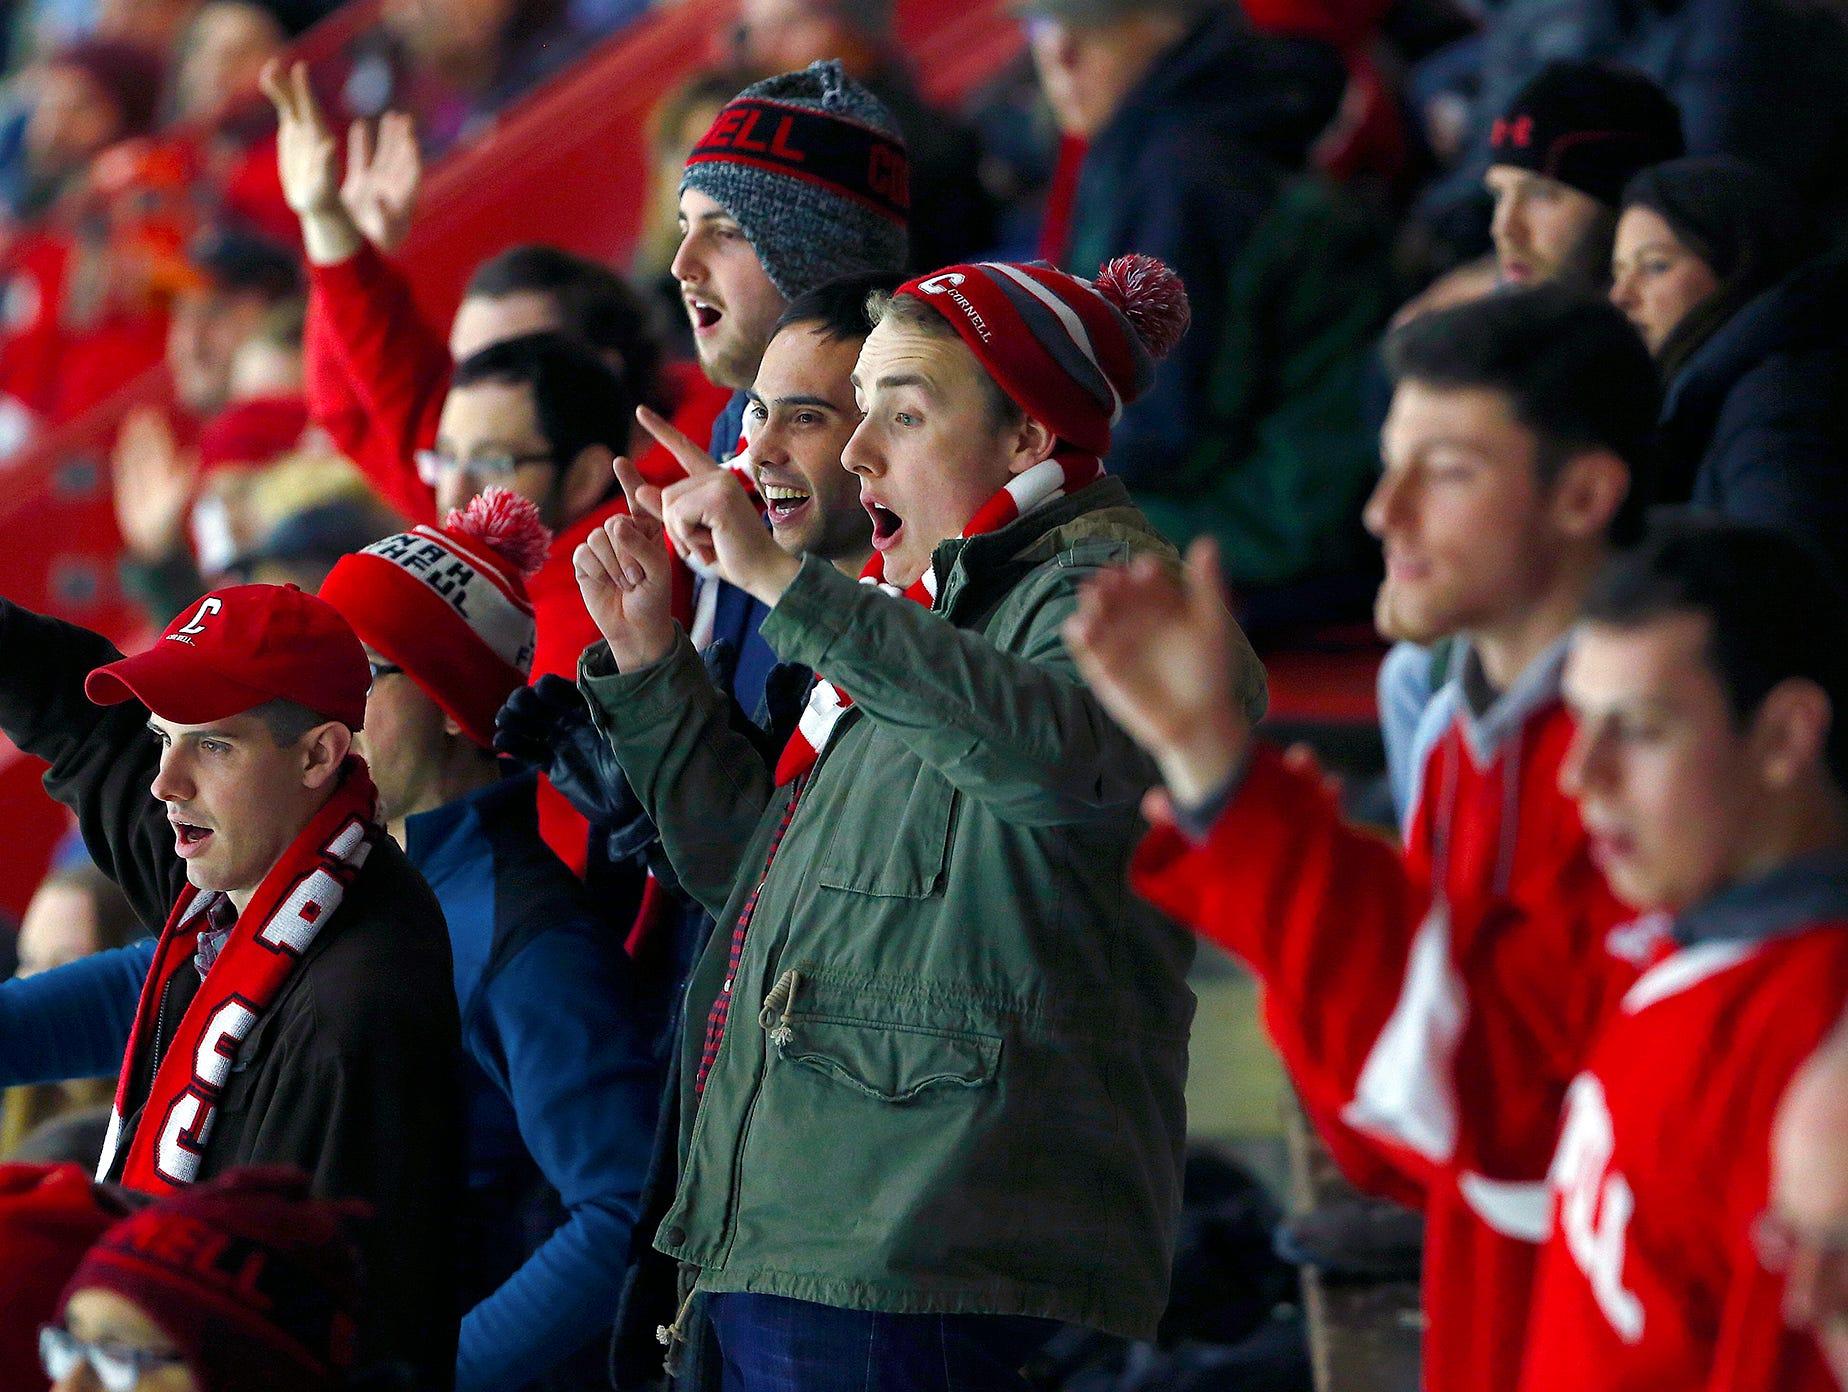 Cornell versus Princeton Men's hockey. Friday, January 5, 2018.